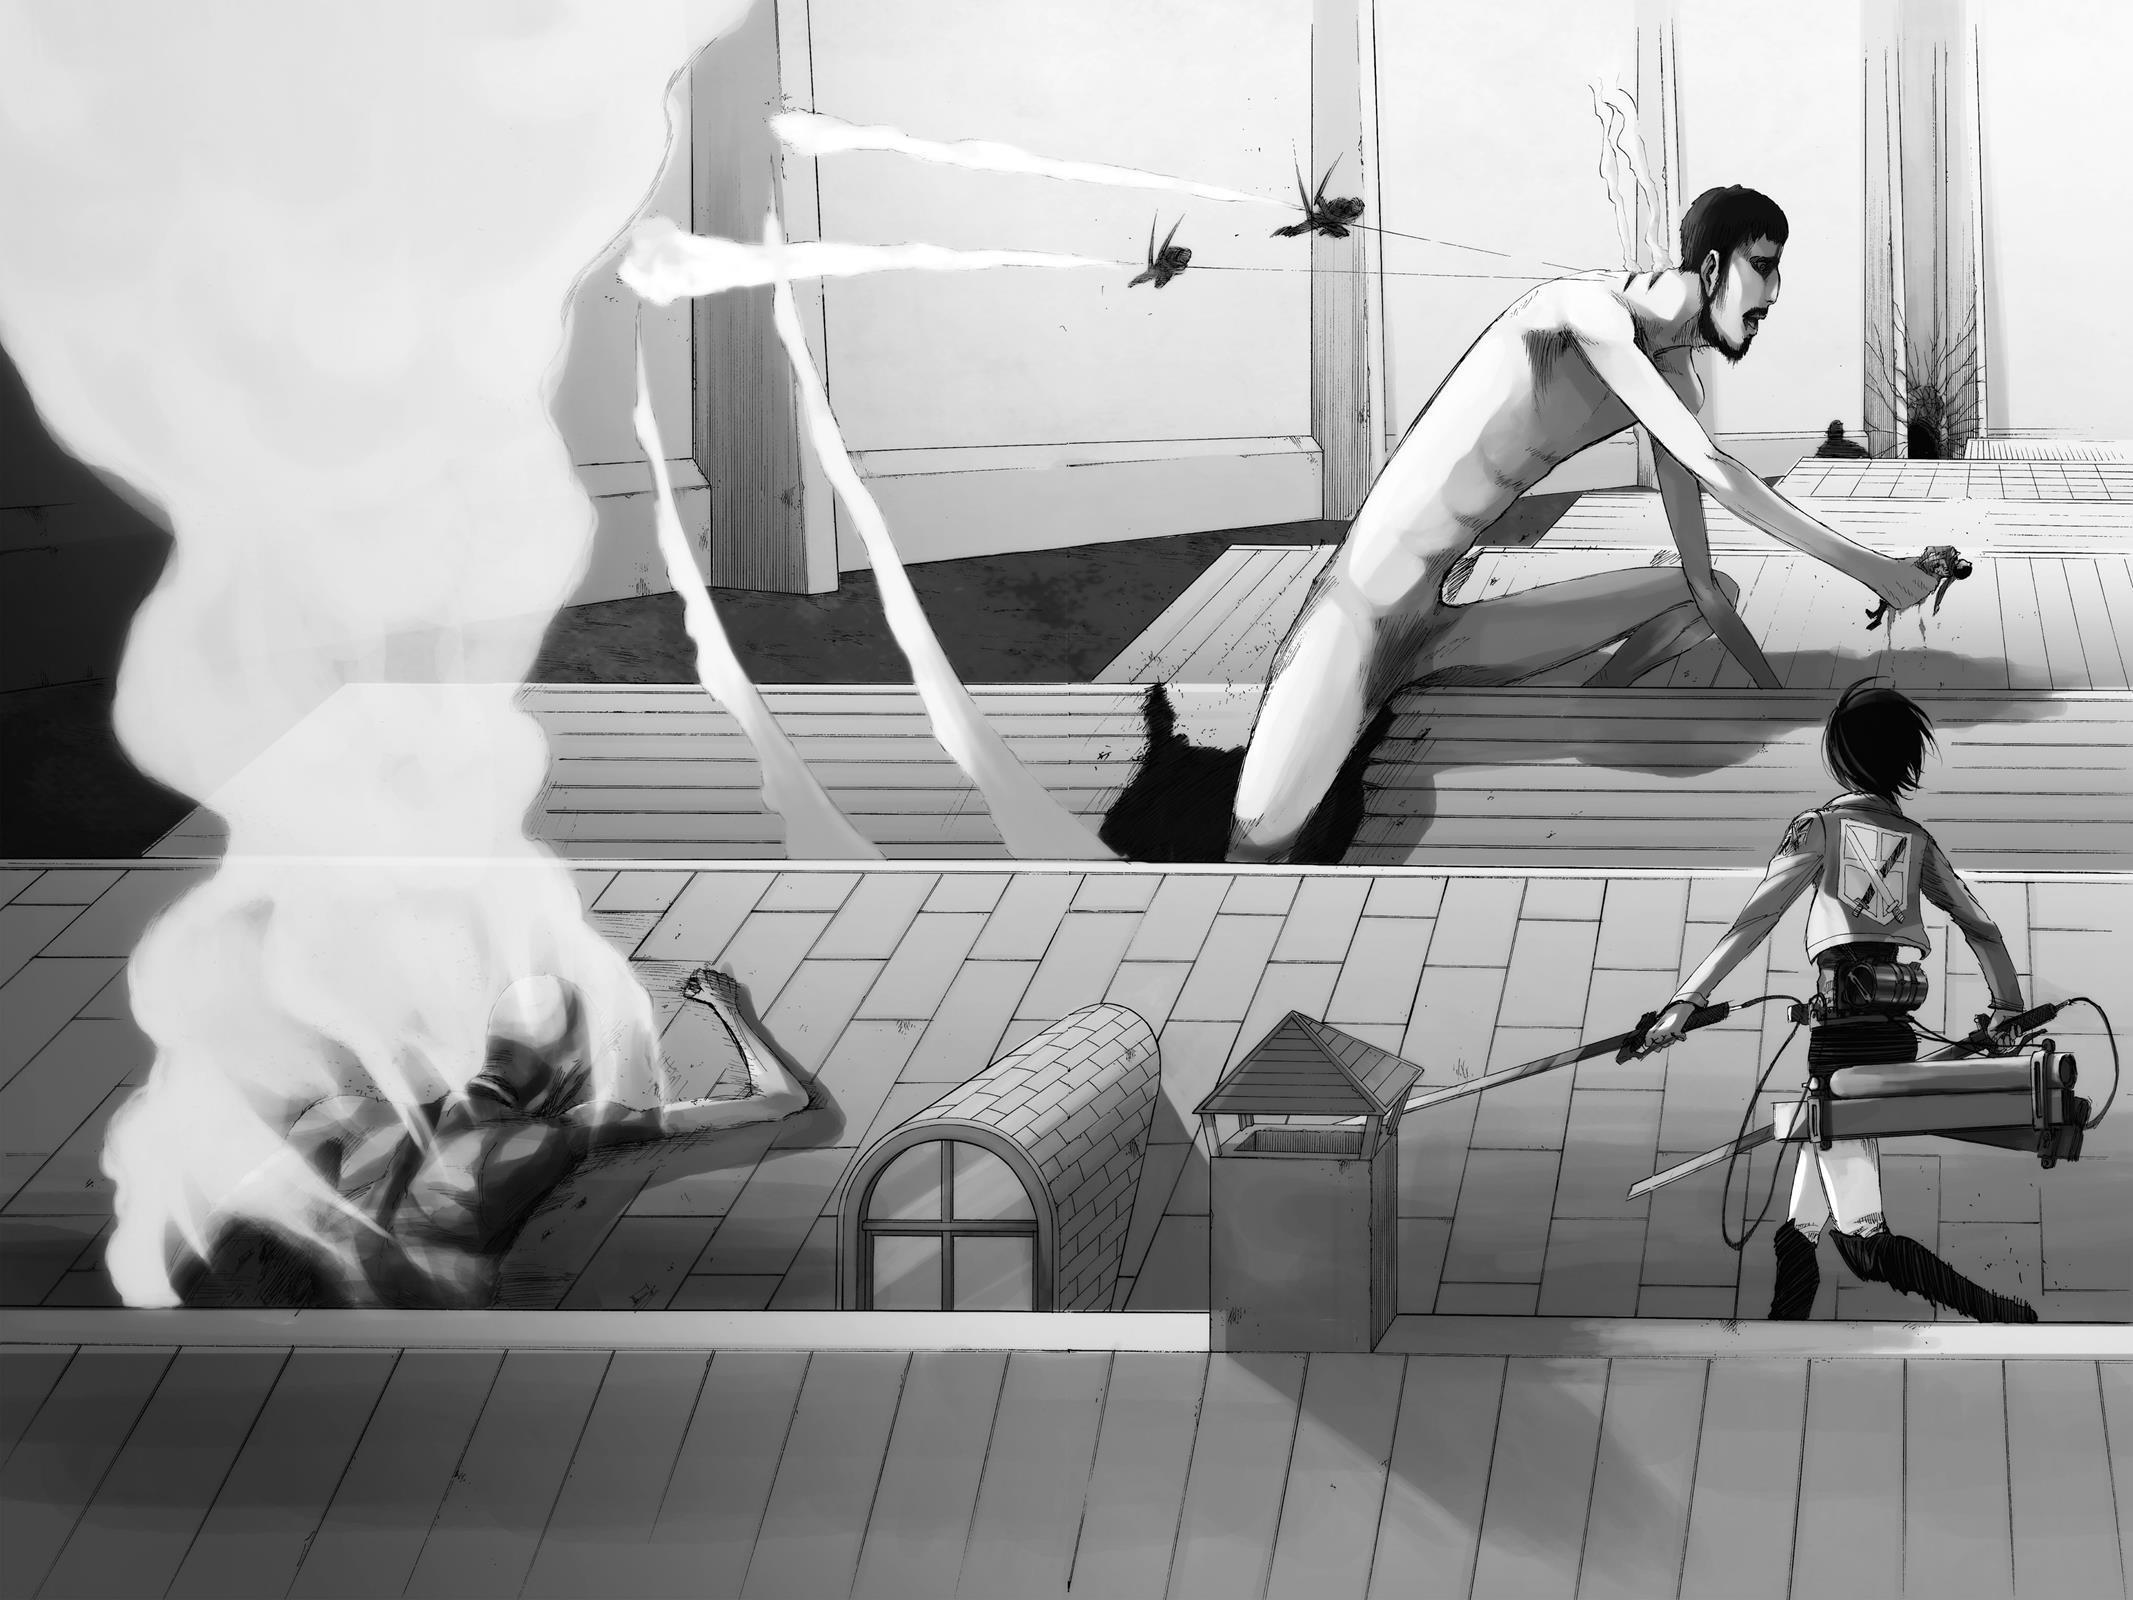 Attack On Titan, Episode 14 image 006